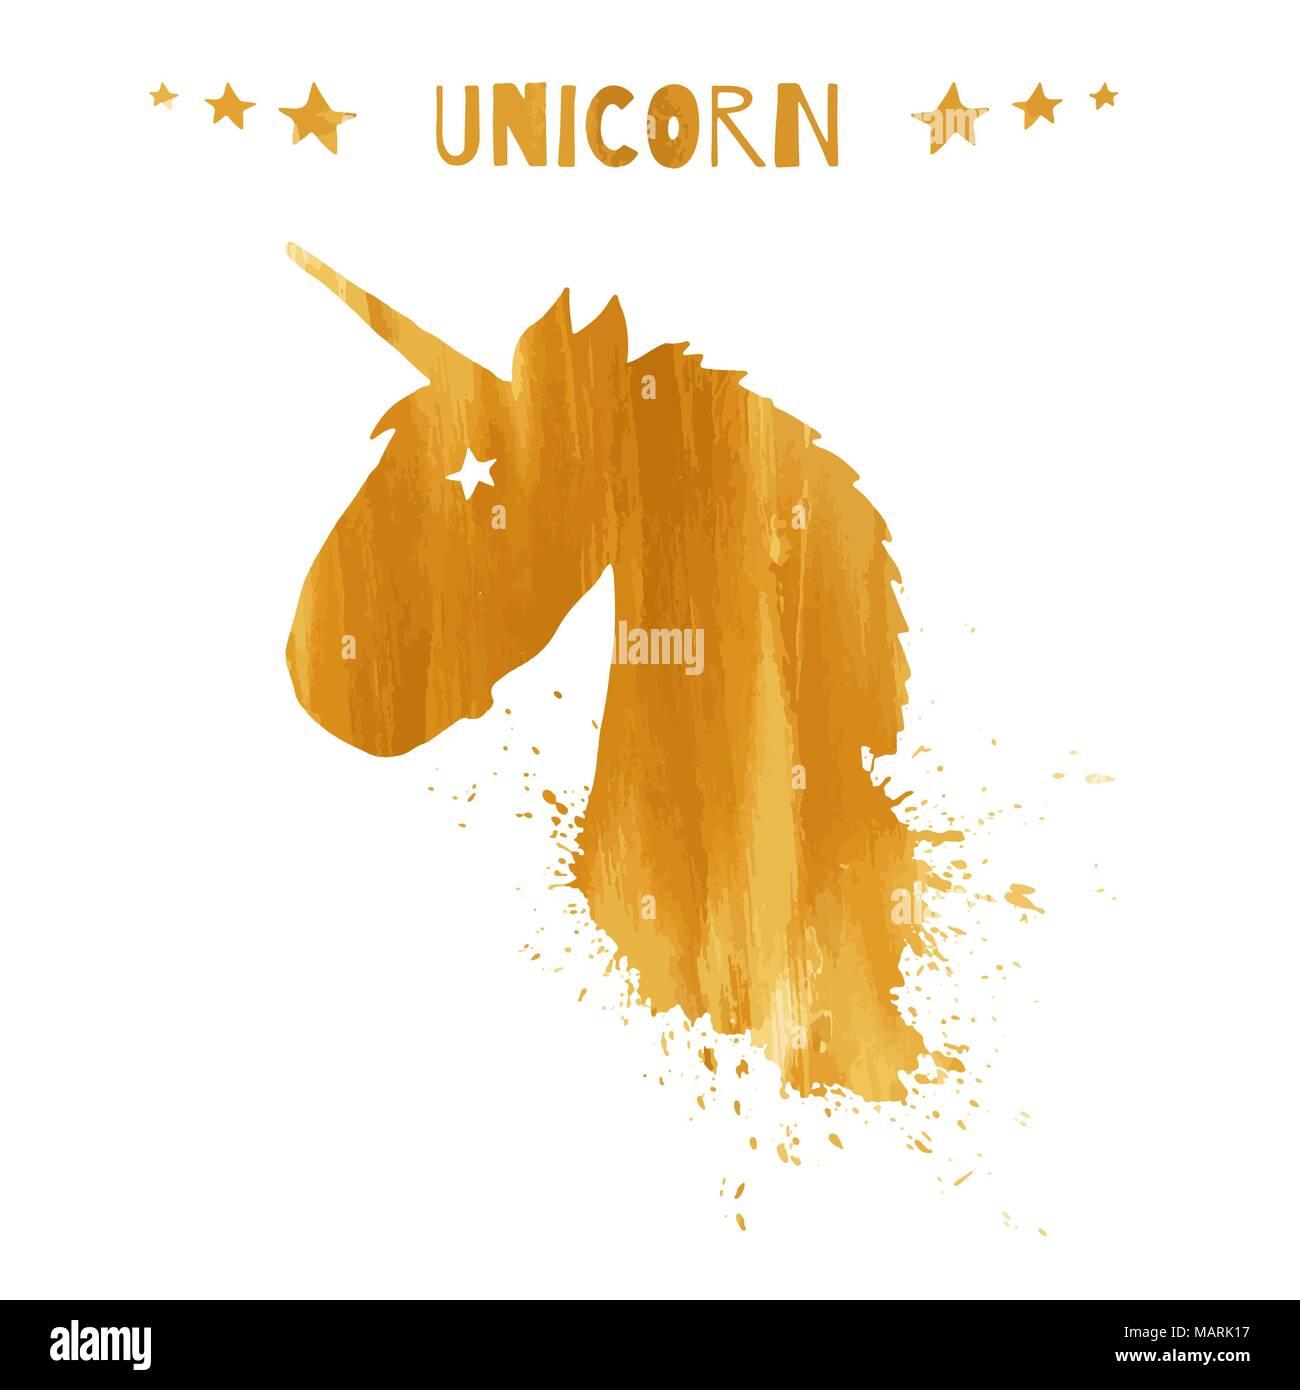 magic unicorn head logo template with golden watercolor splashes